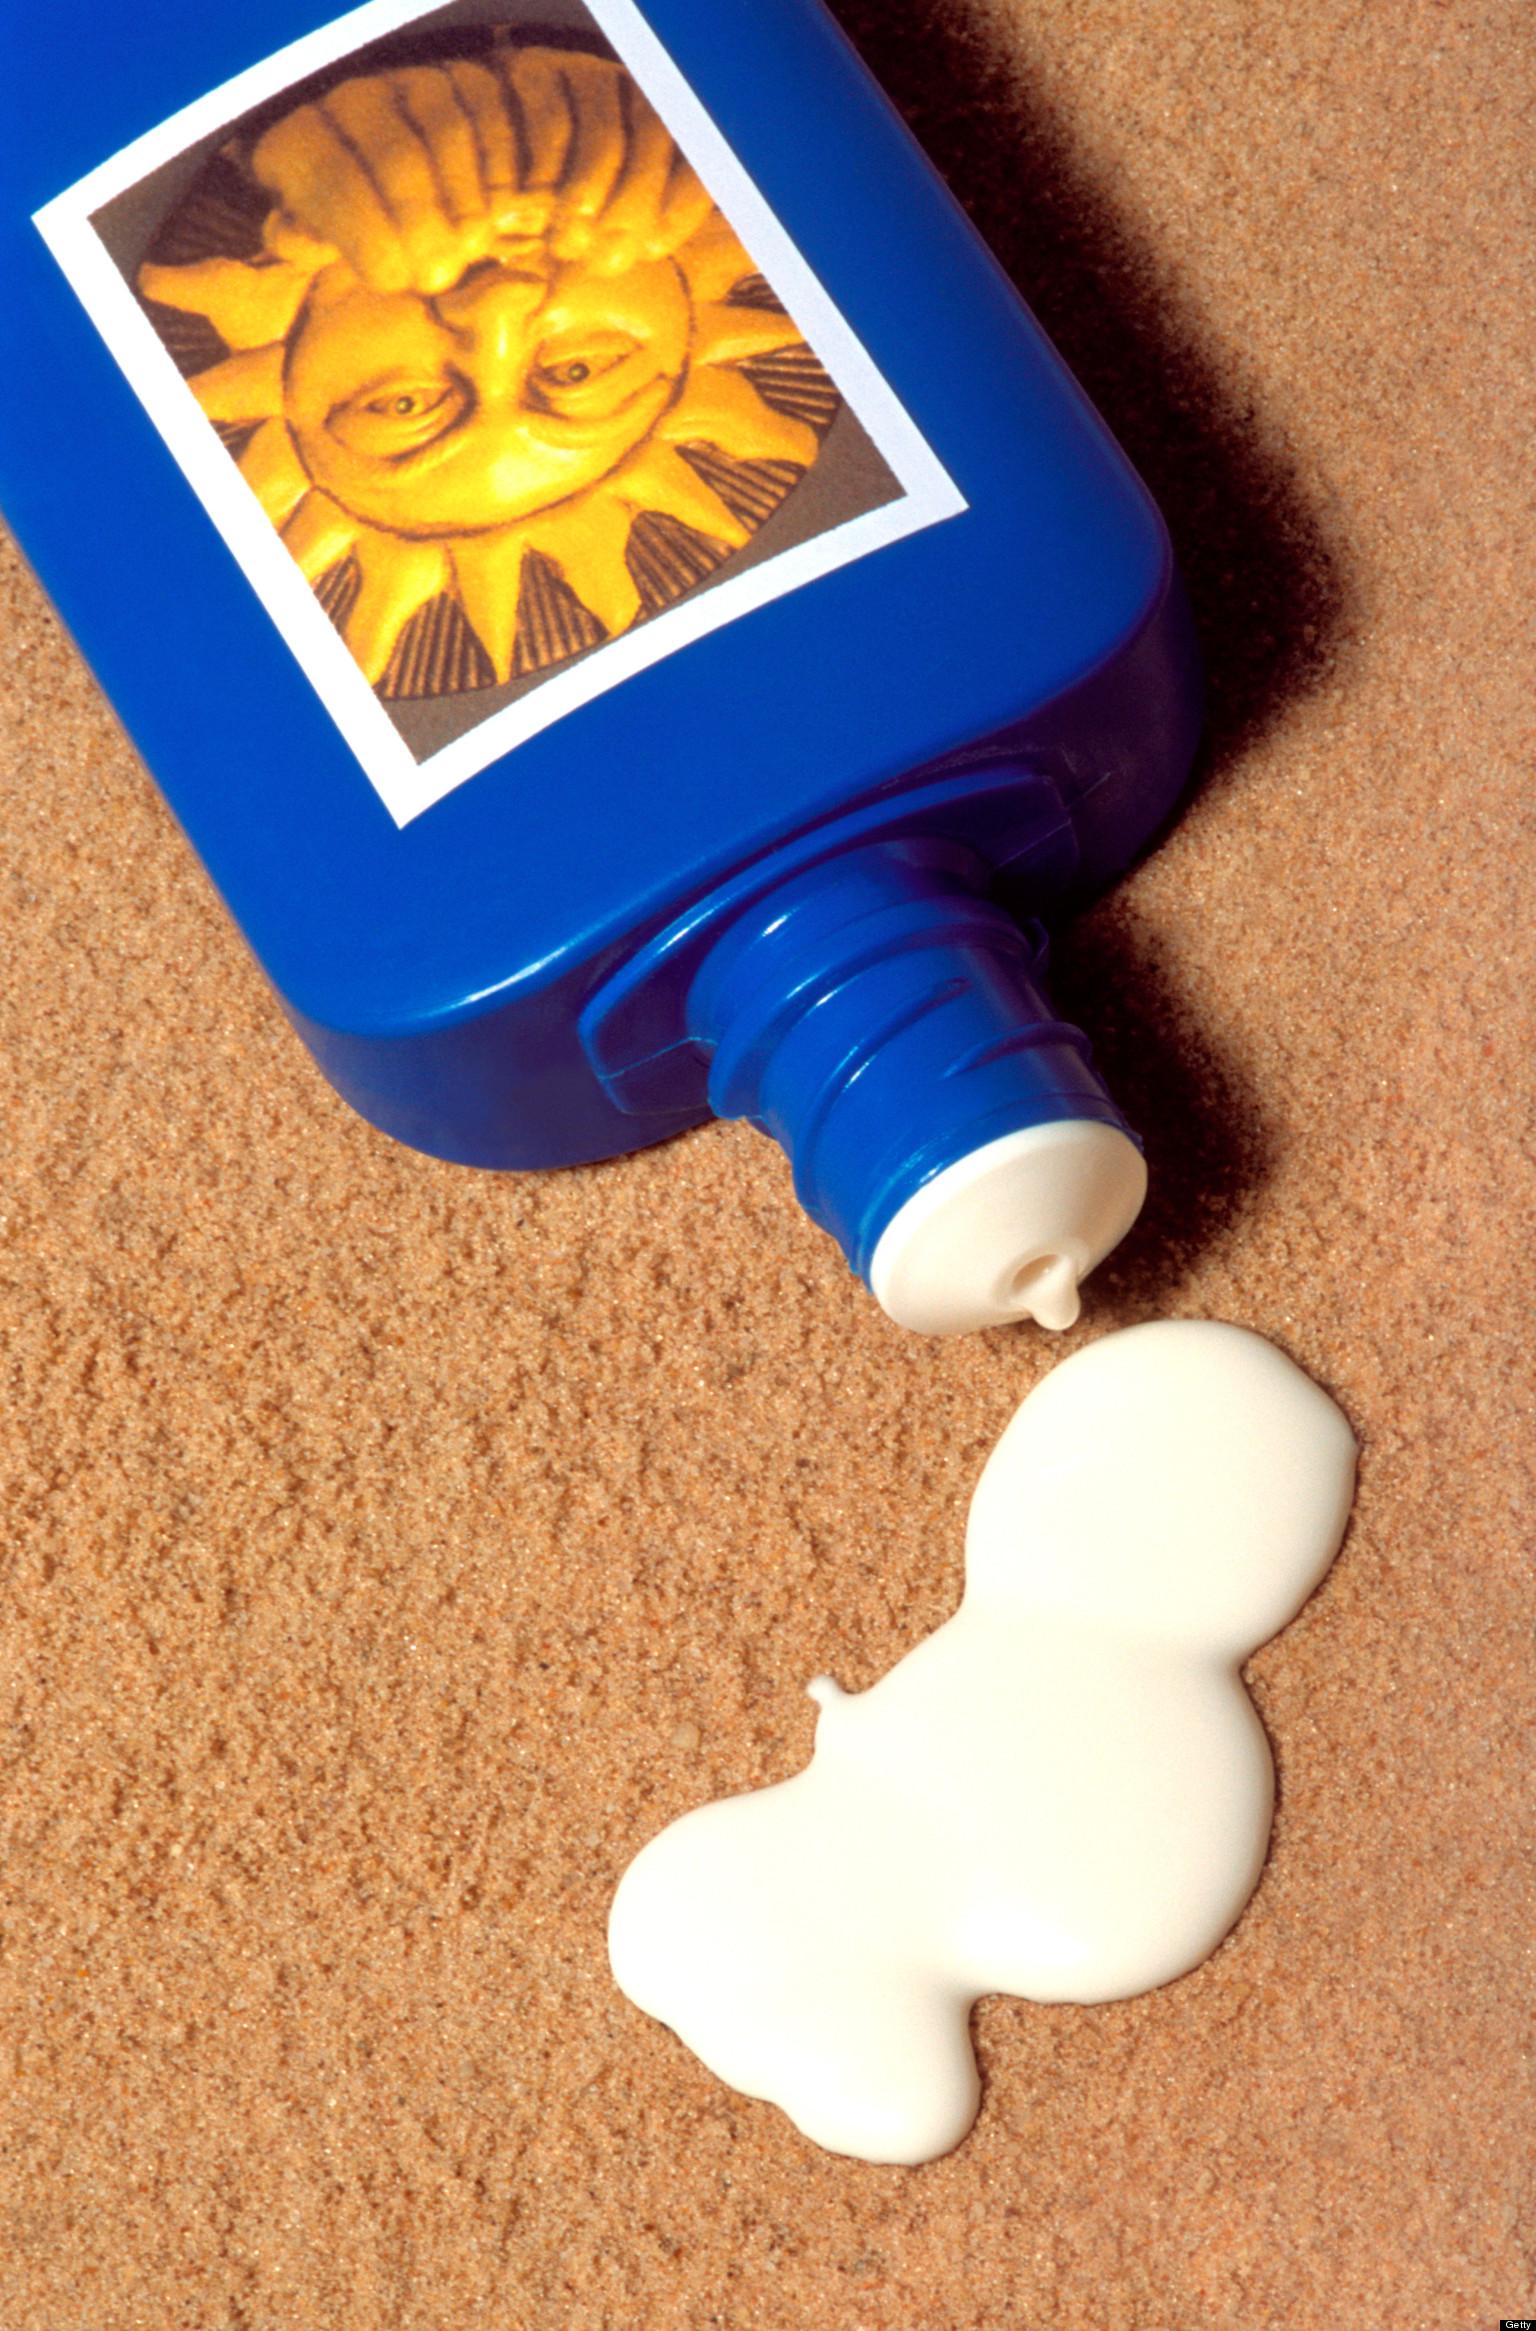 Winter sunscreen recommendation: winter anti-UV 3 Japan Sunscreen